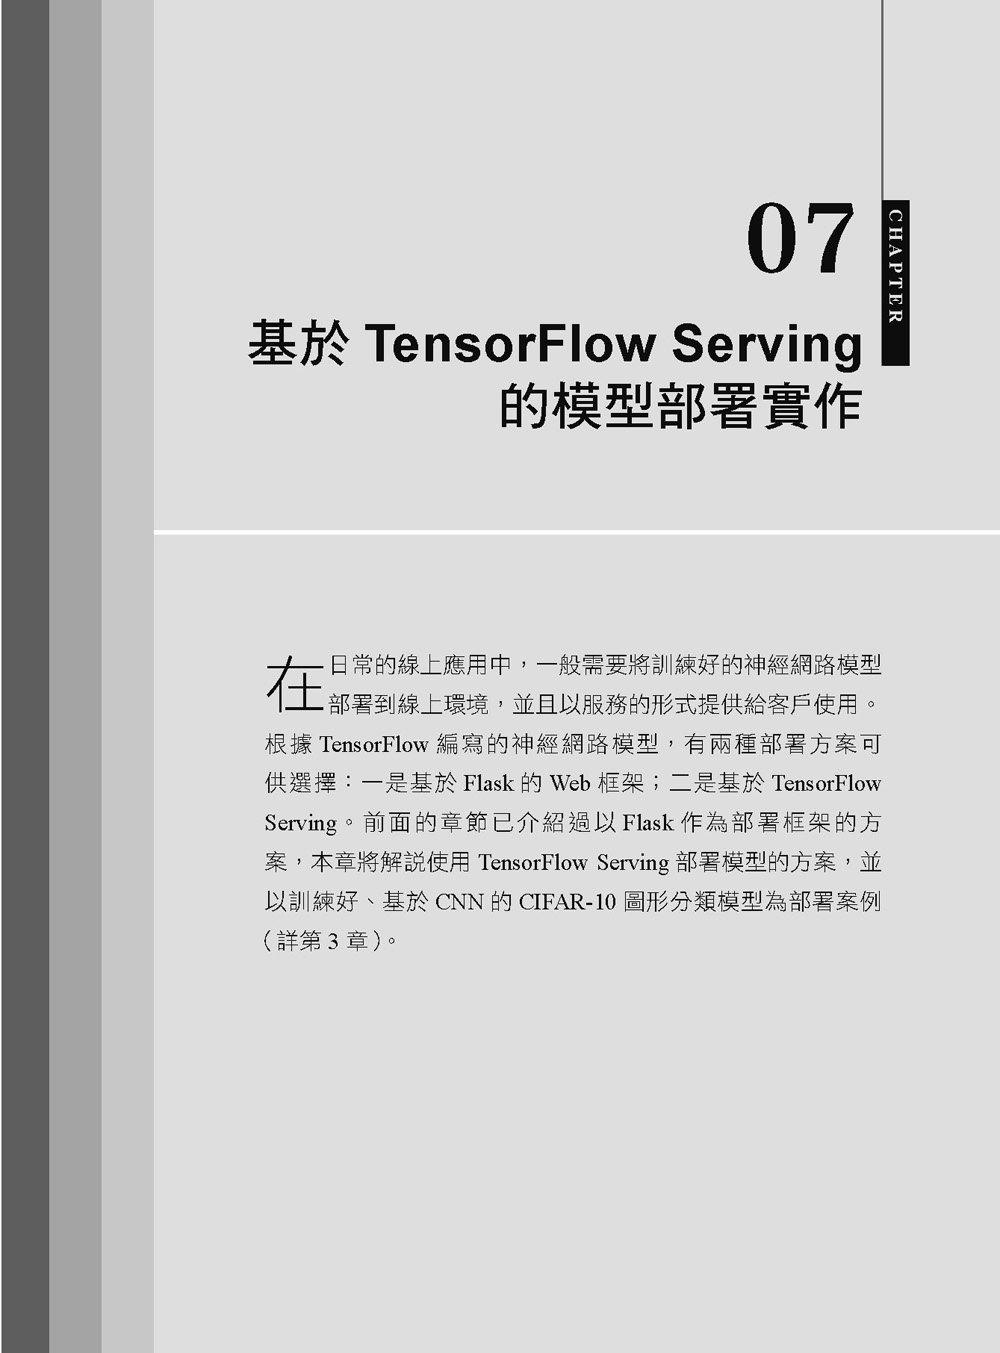 TensorFlow 2.0 深度學習快速入門:從1到2快人一步,從0到2一步到位-preview-10